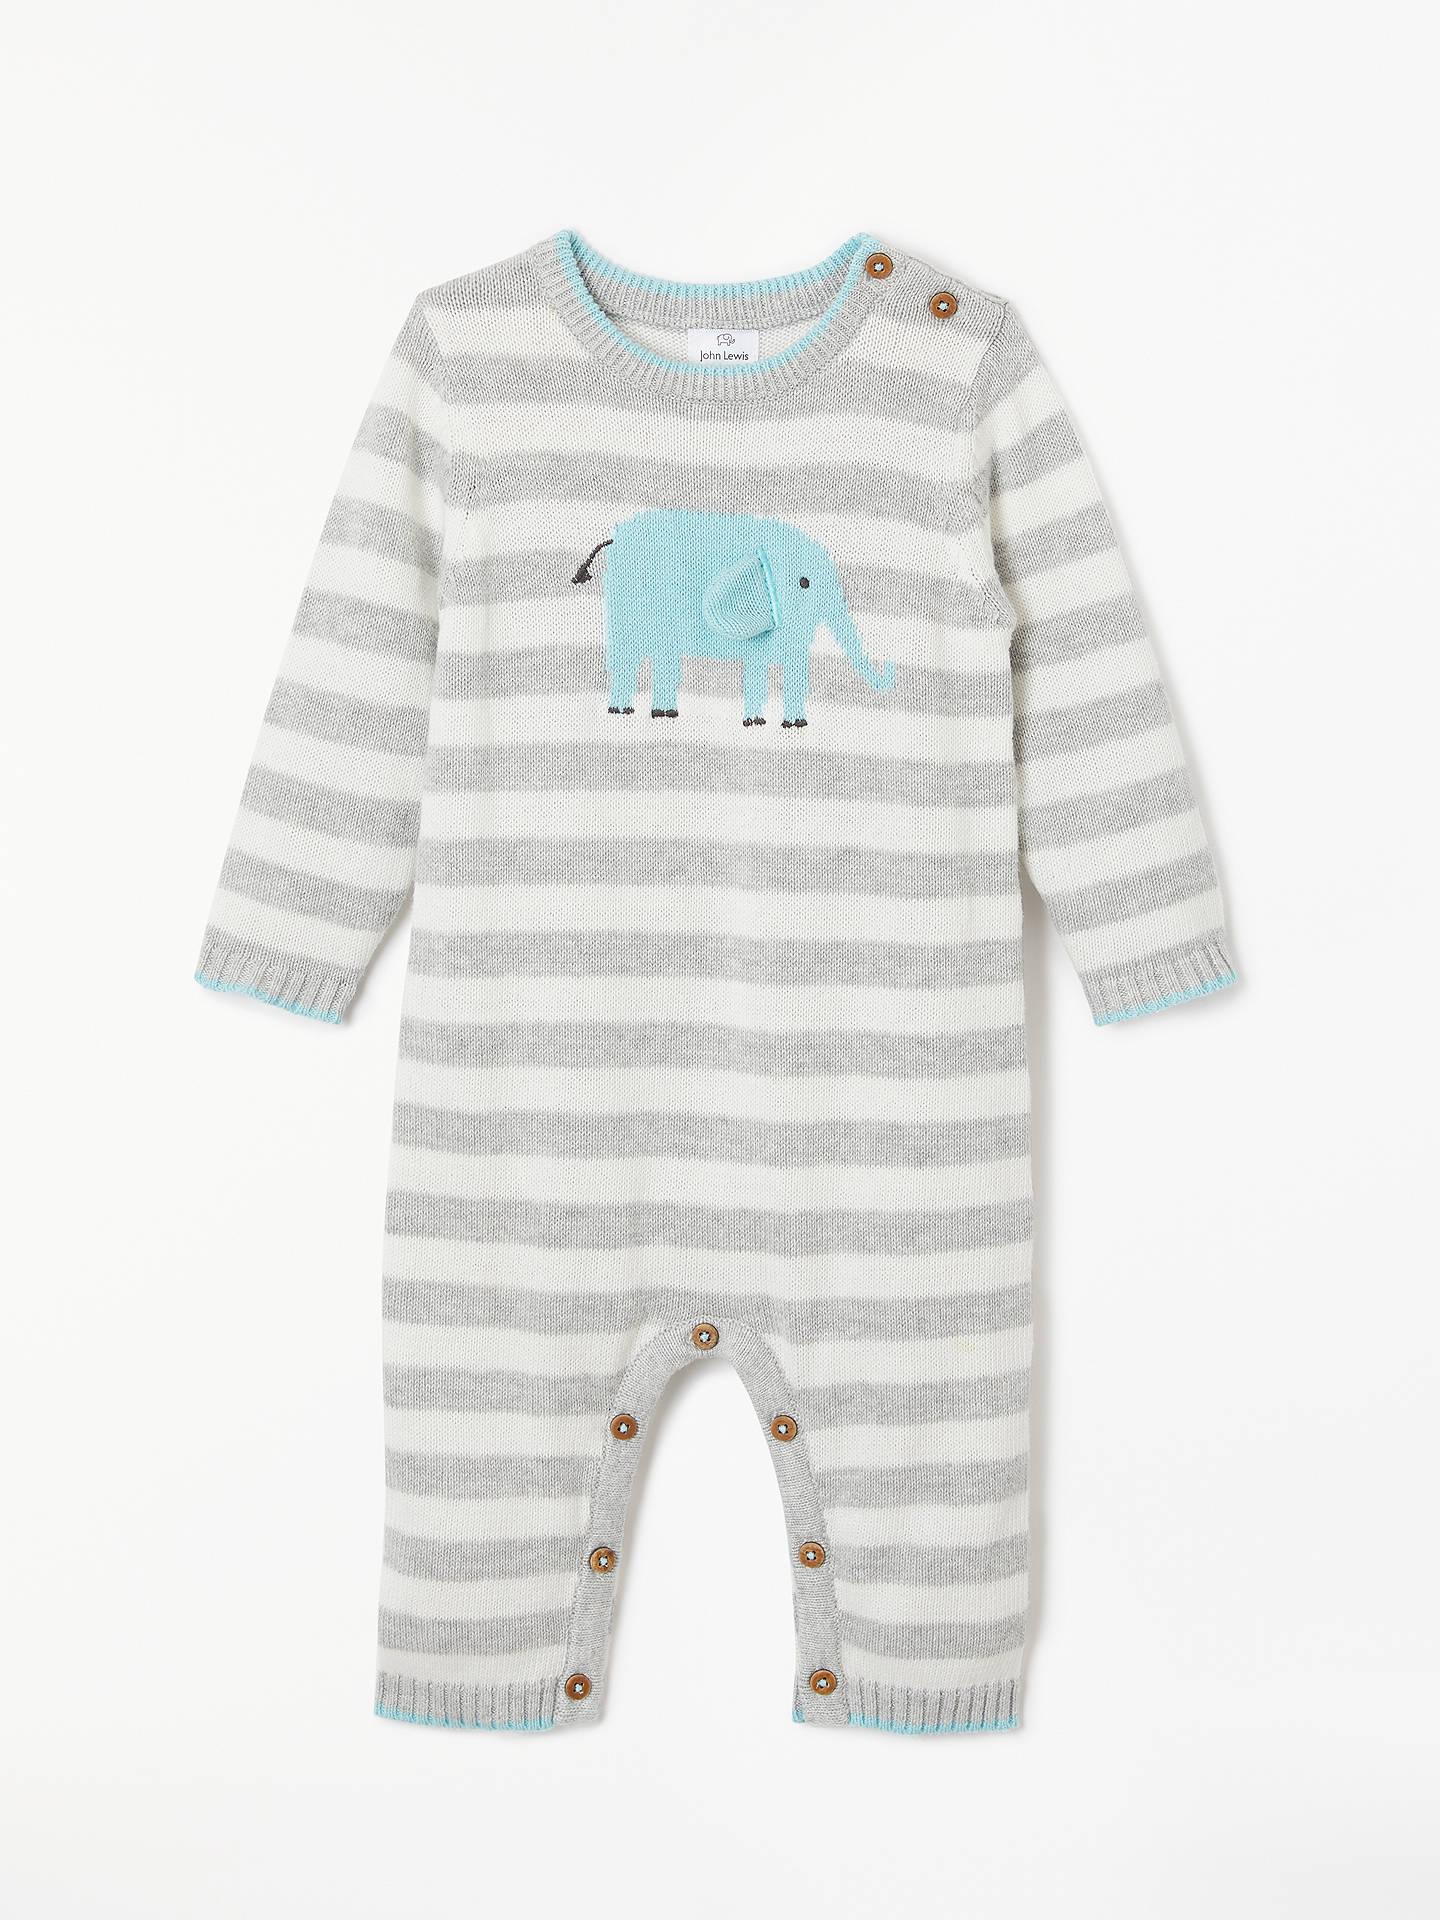 eb5683c6a10f Buy John Lewis   Partners Baby Knitted Stripe Elephant Romper